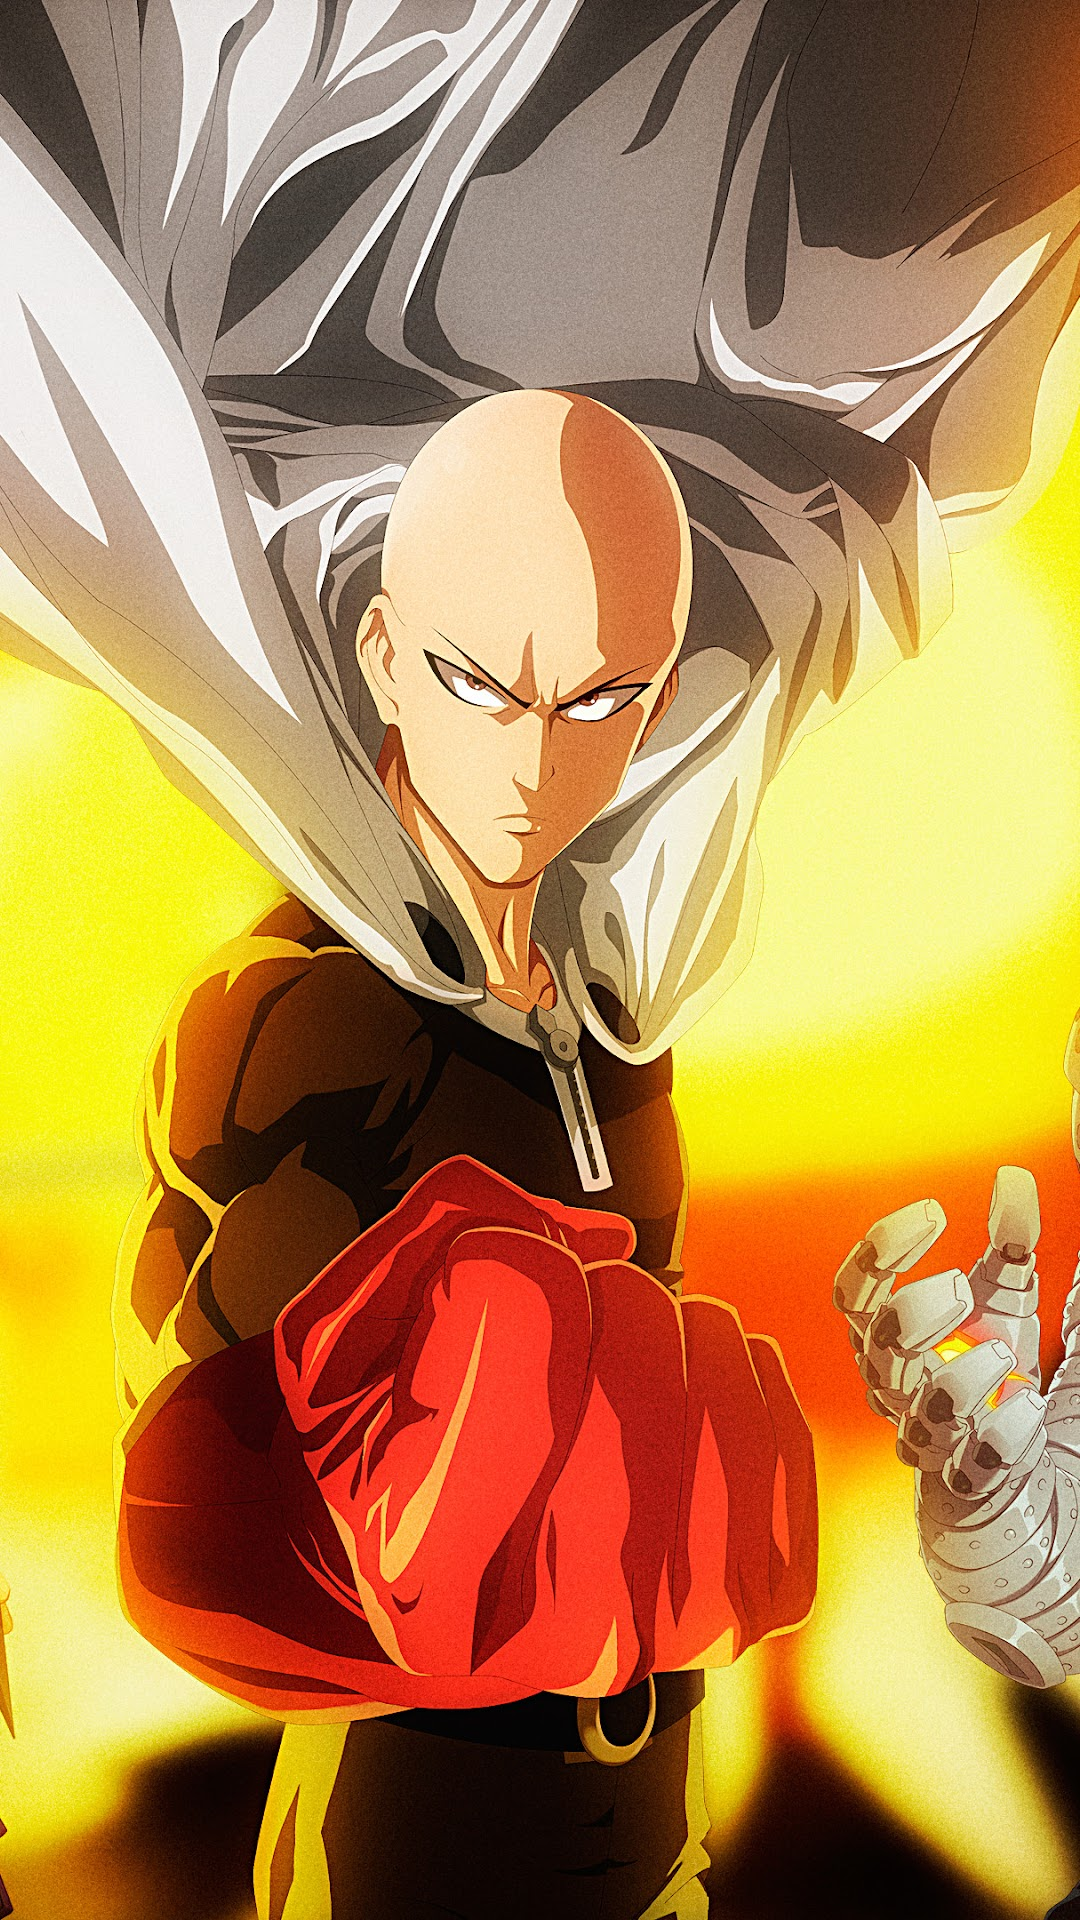 One Punch Man Iphone Xs Wallpaper - Anime Wallpaper HD